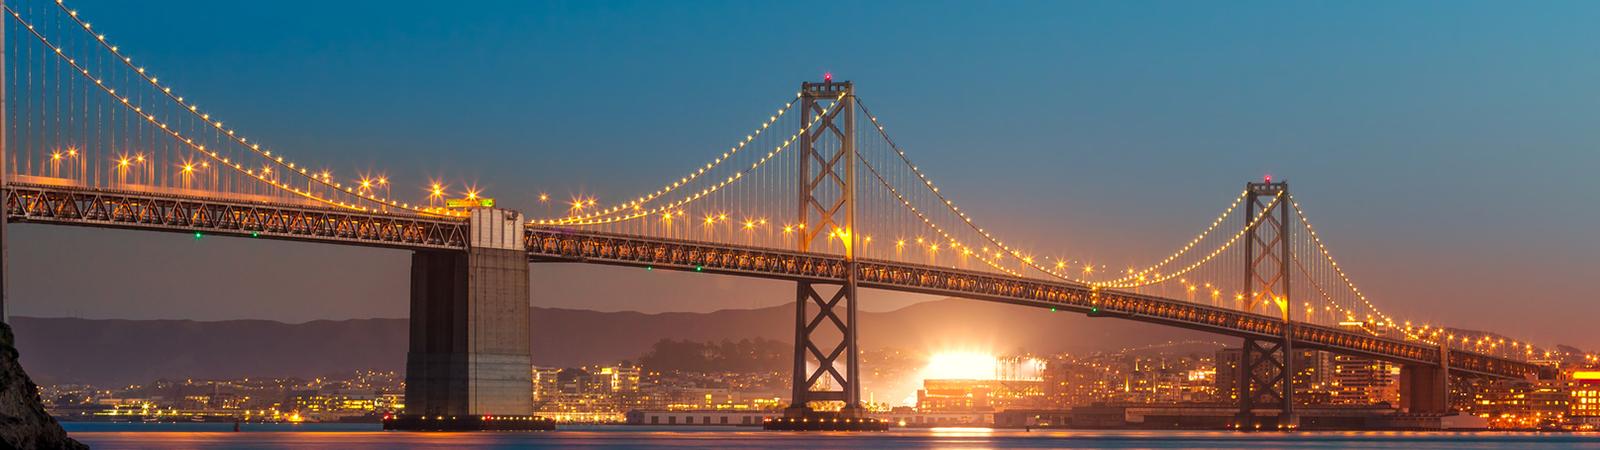 Photo of a Bay Area Bridge